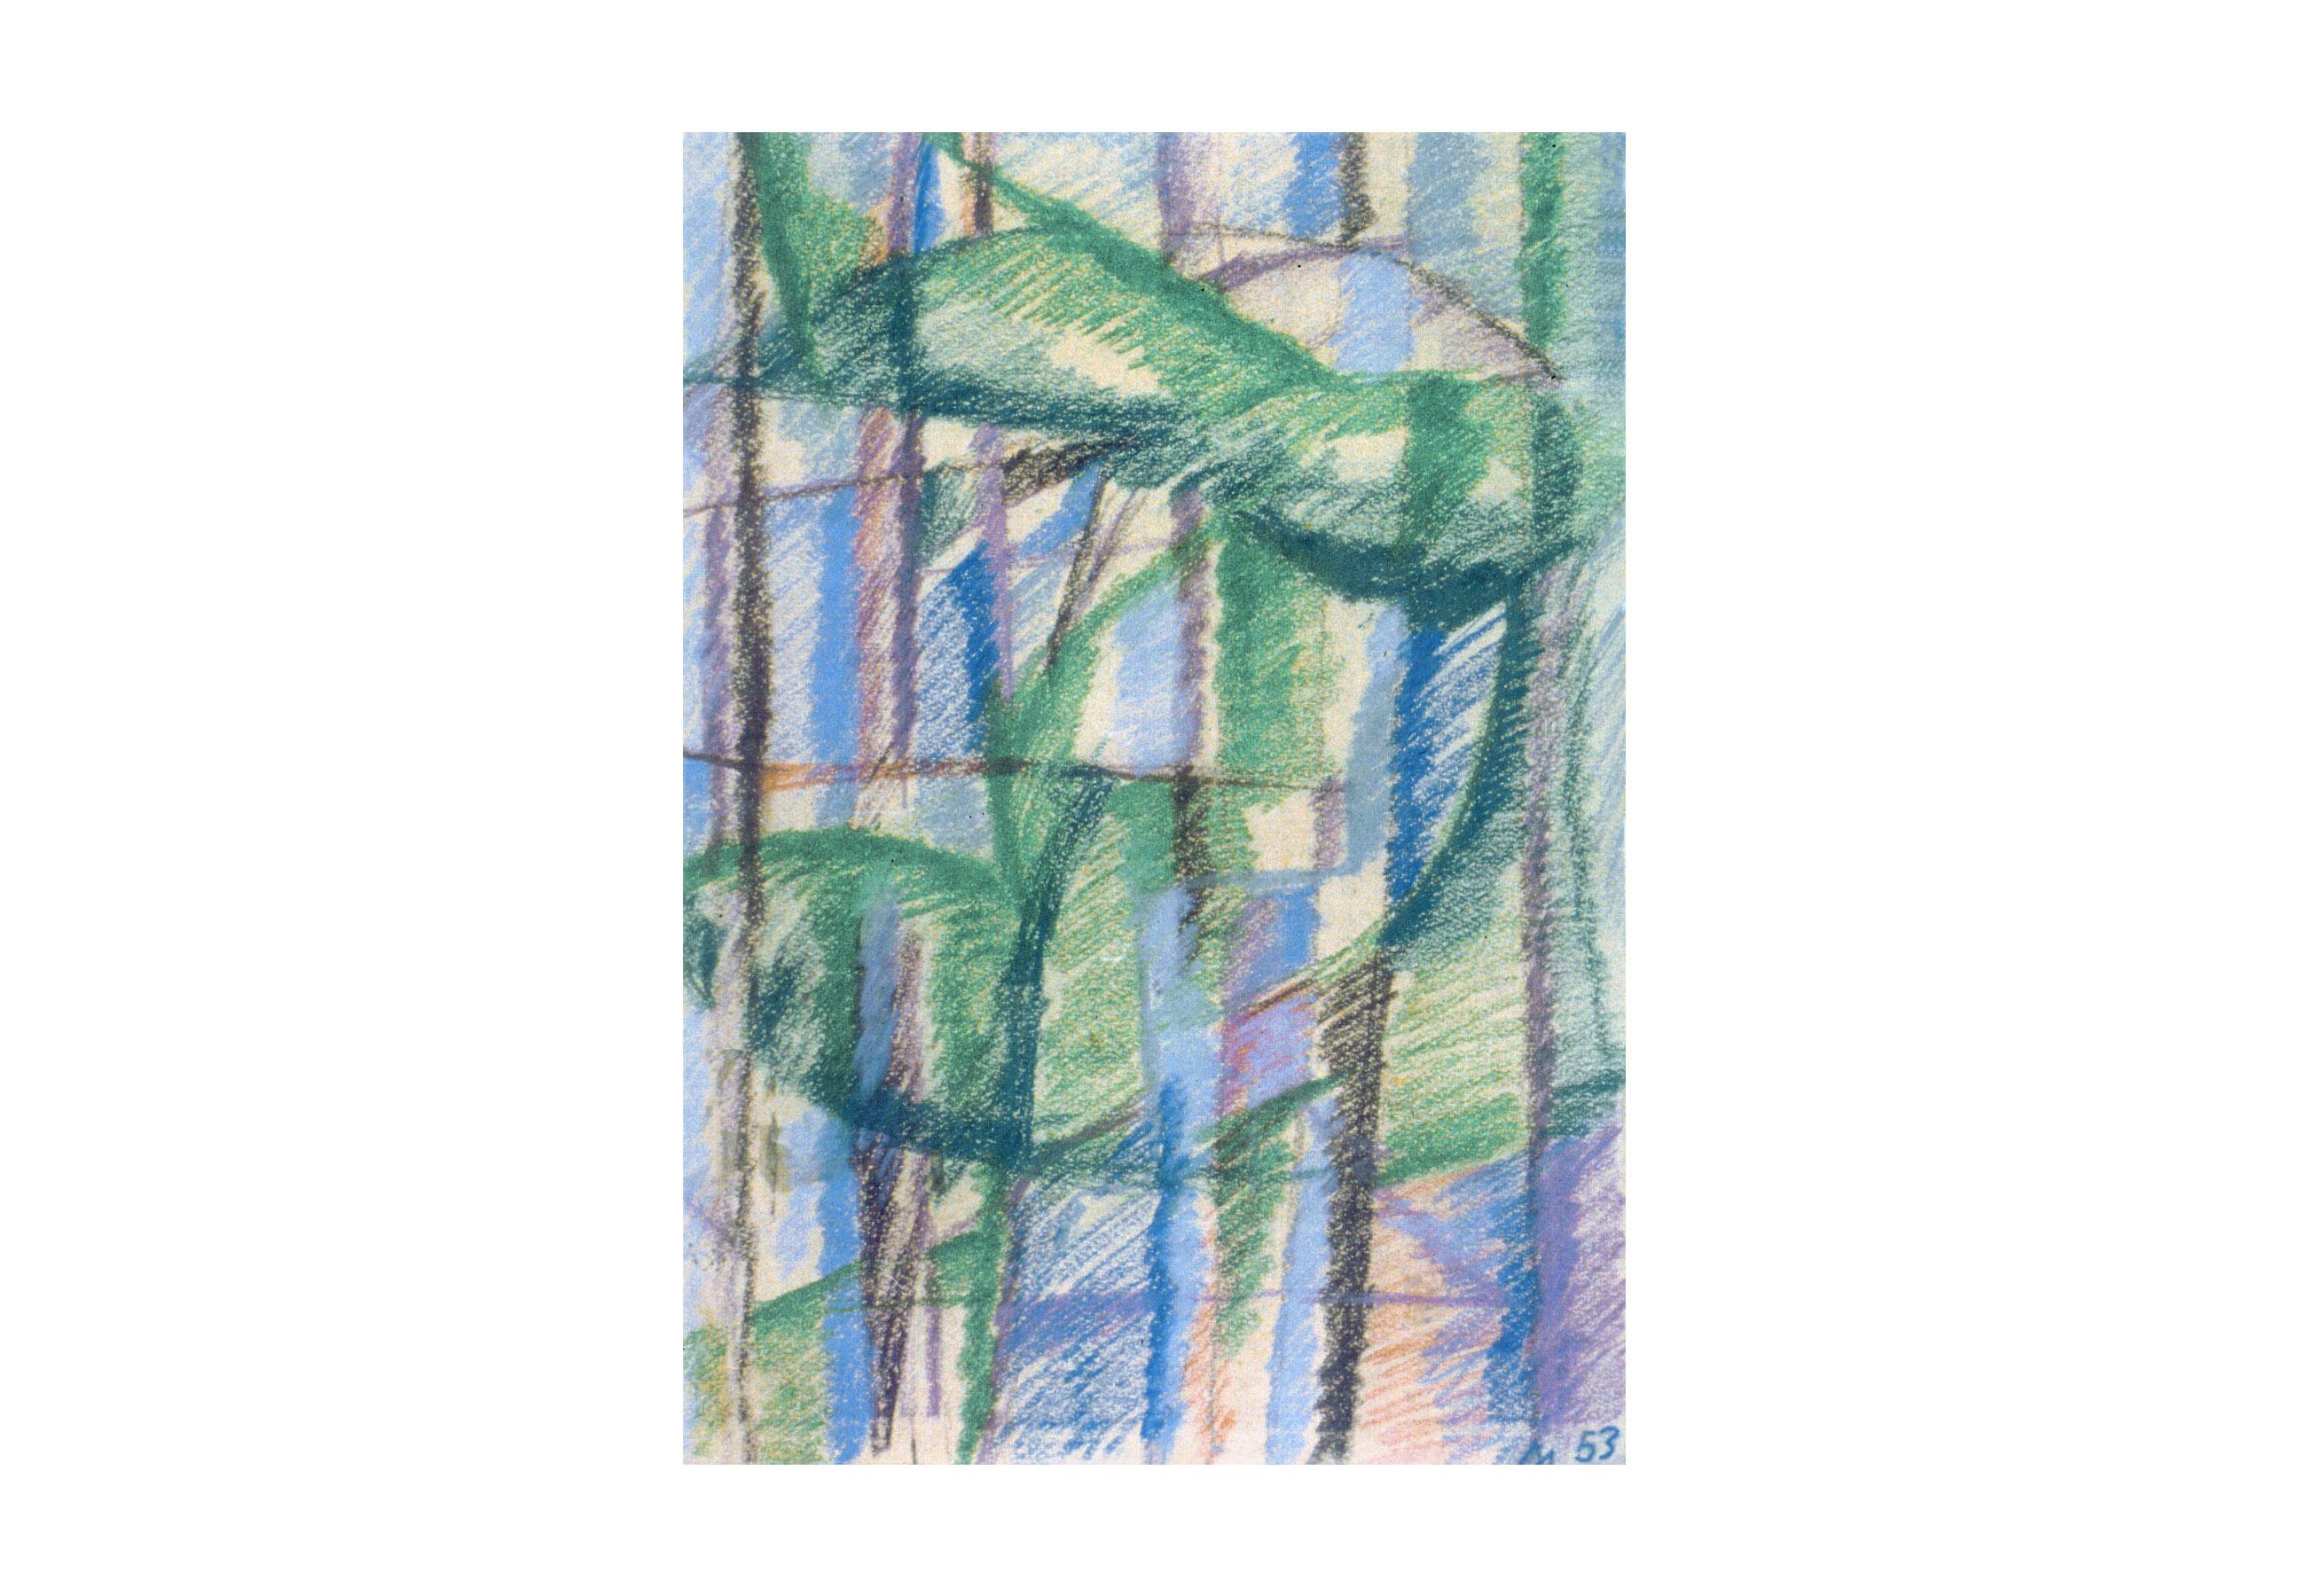 Lamm-Portfolio-Sky-Apering-Forest.jpg